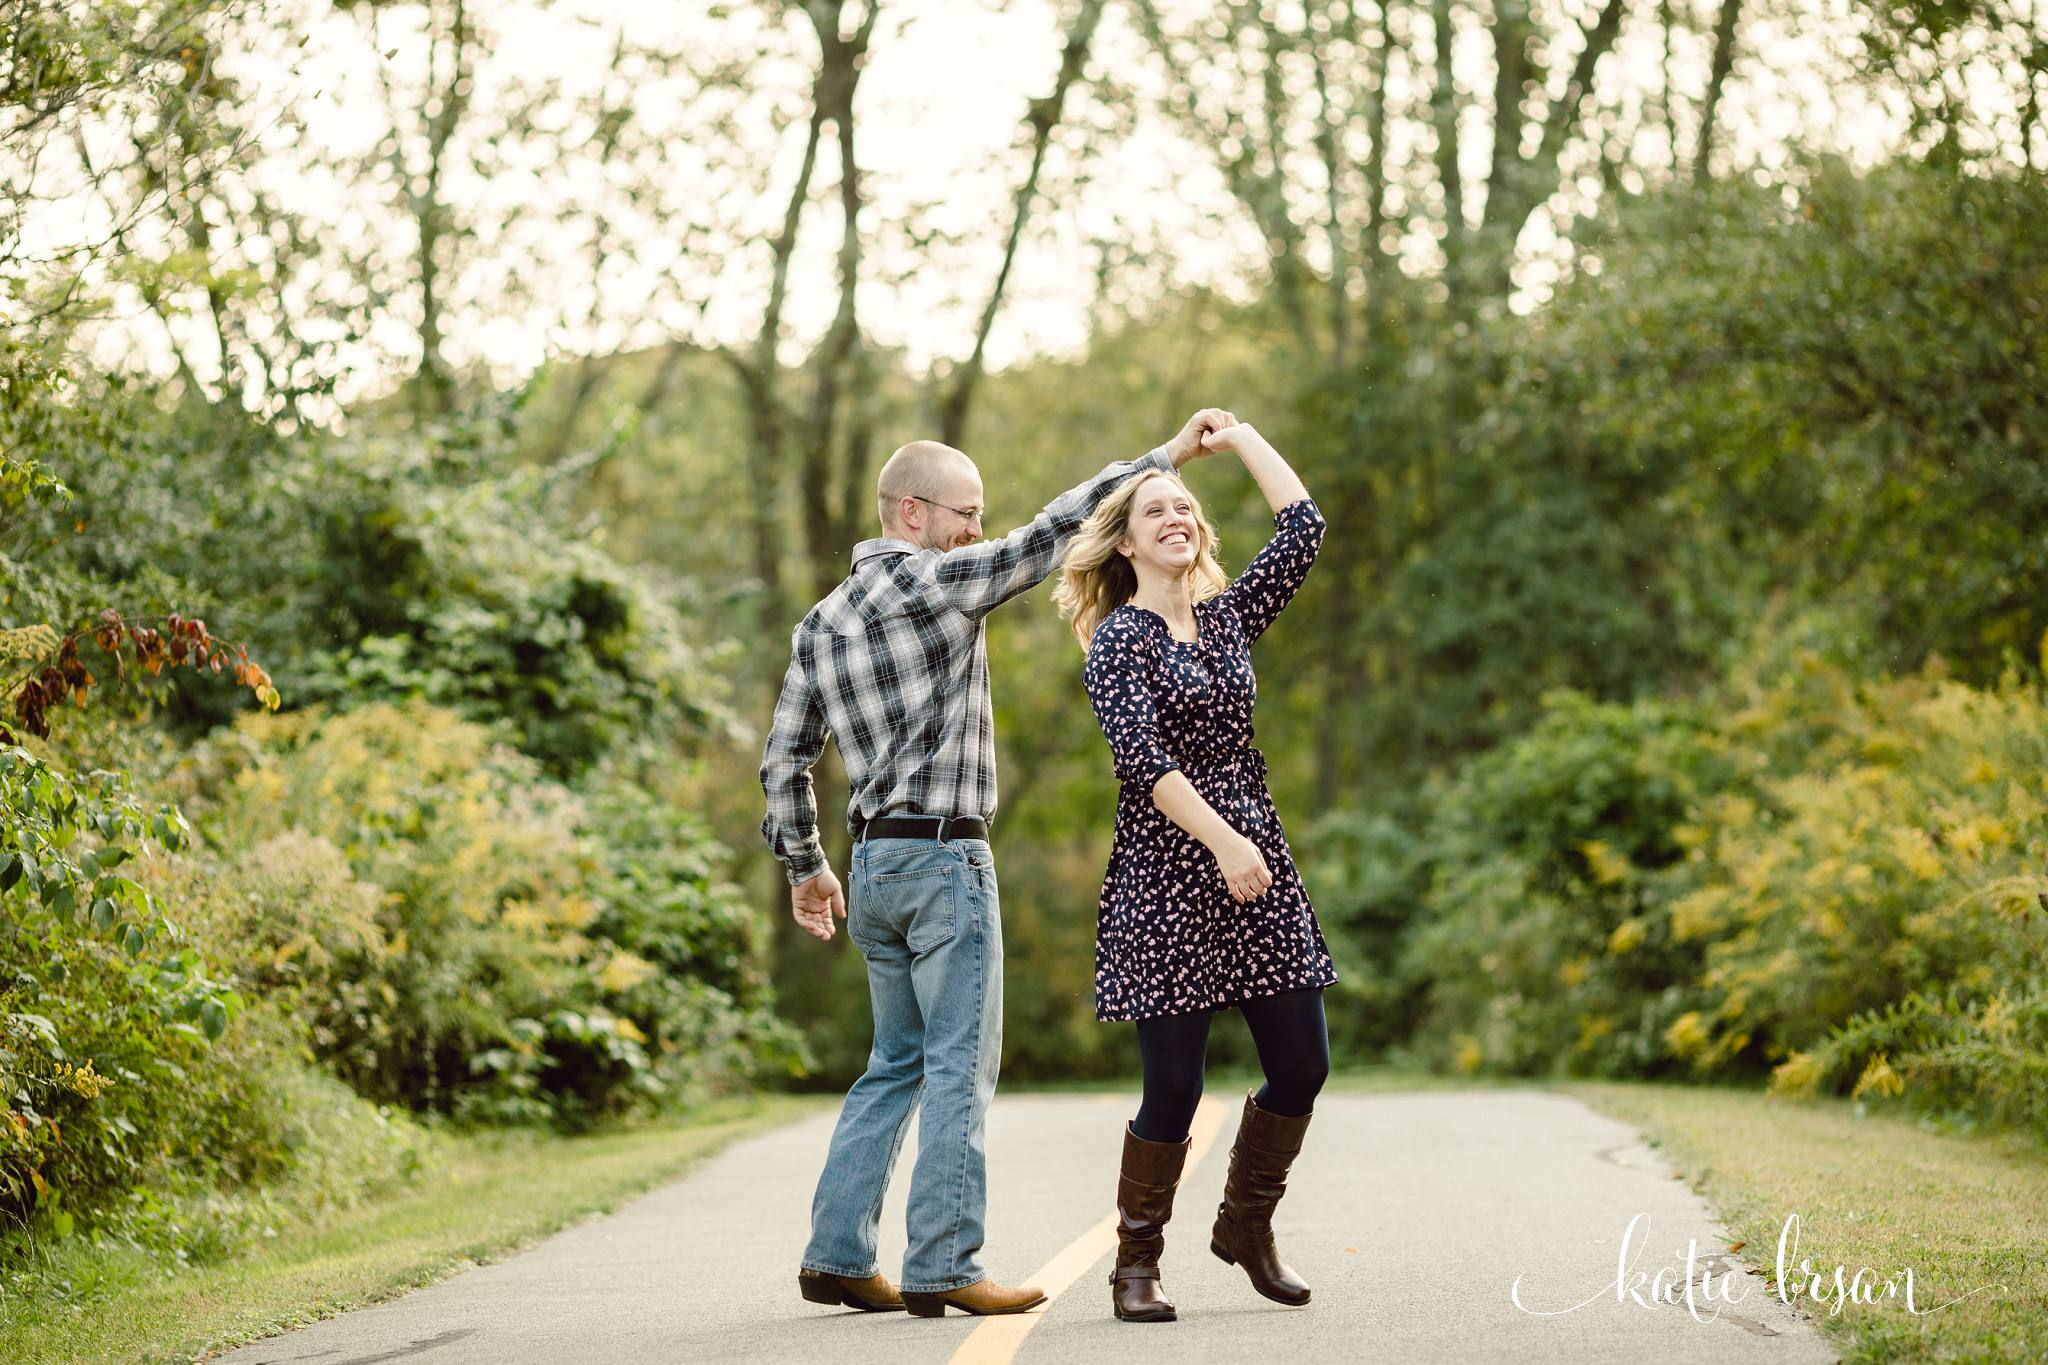 KatieBrsan-Frankfort-EngagementPhotos_0504.jpg